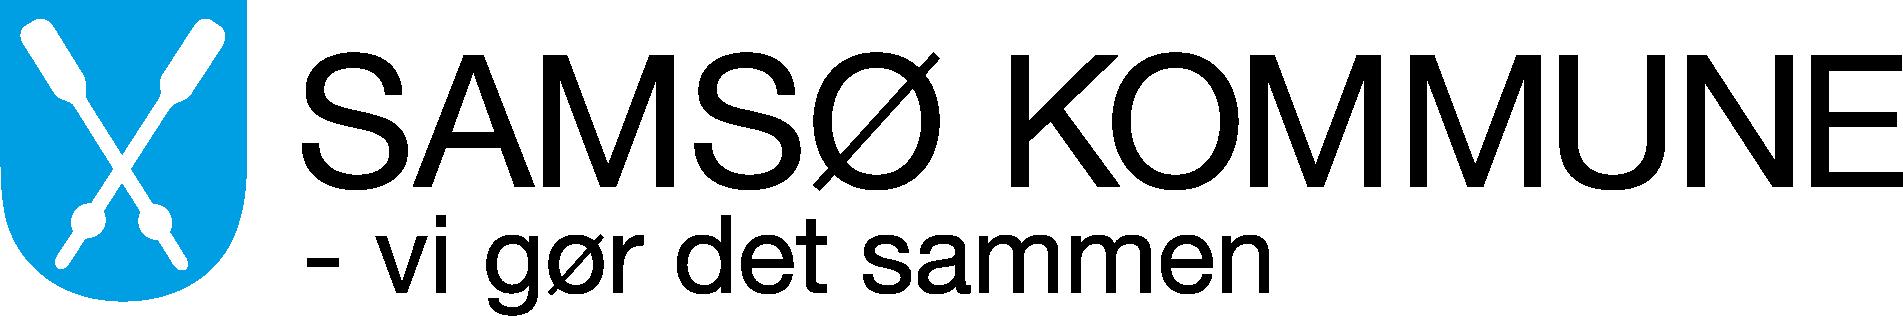 Samsø Kommune logo